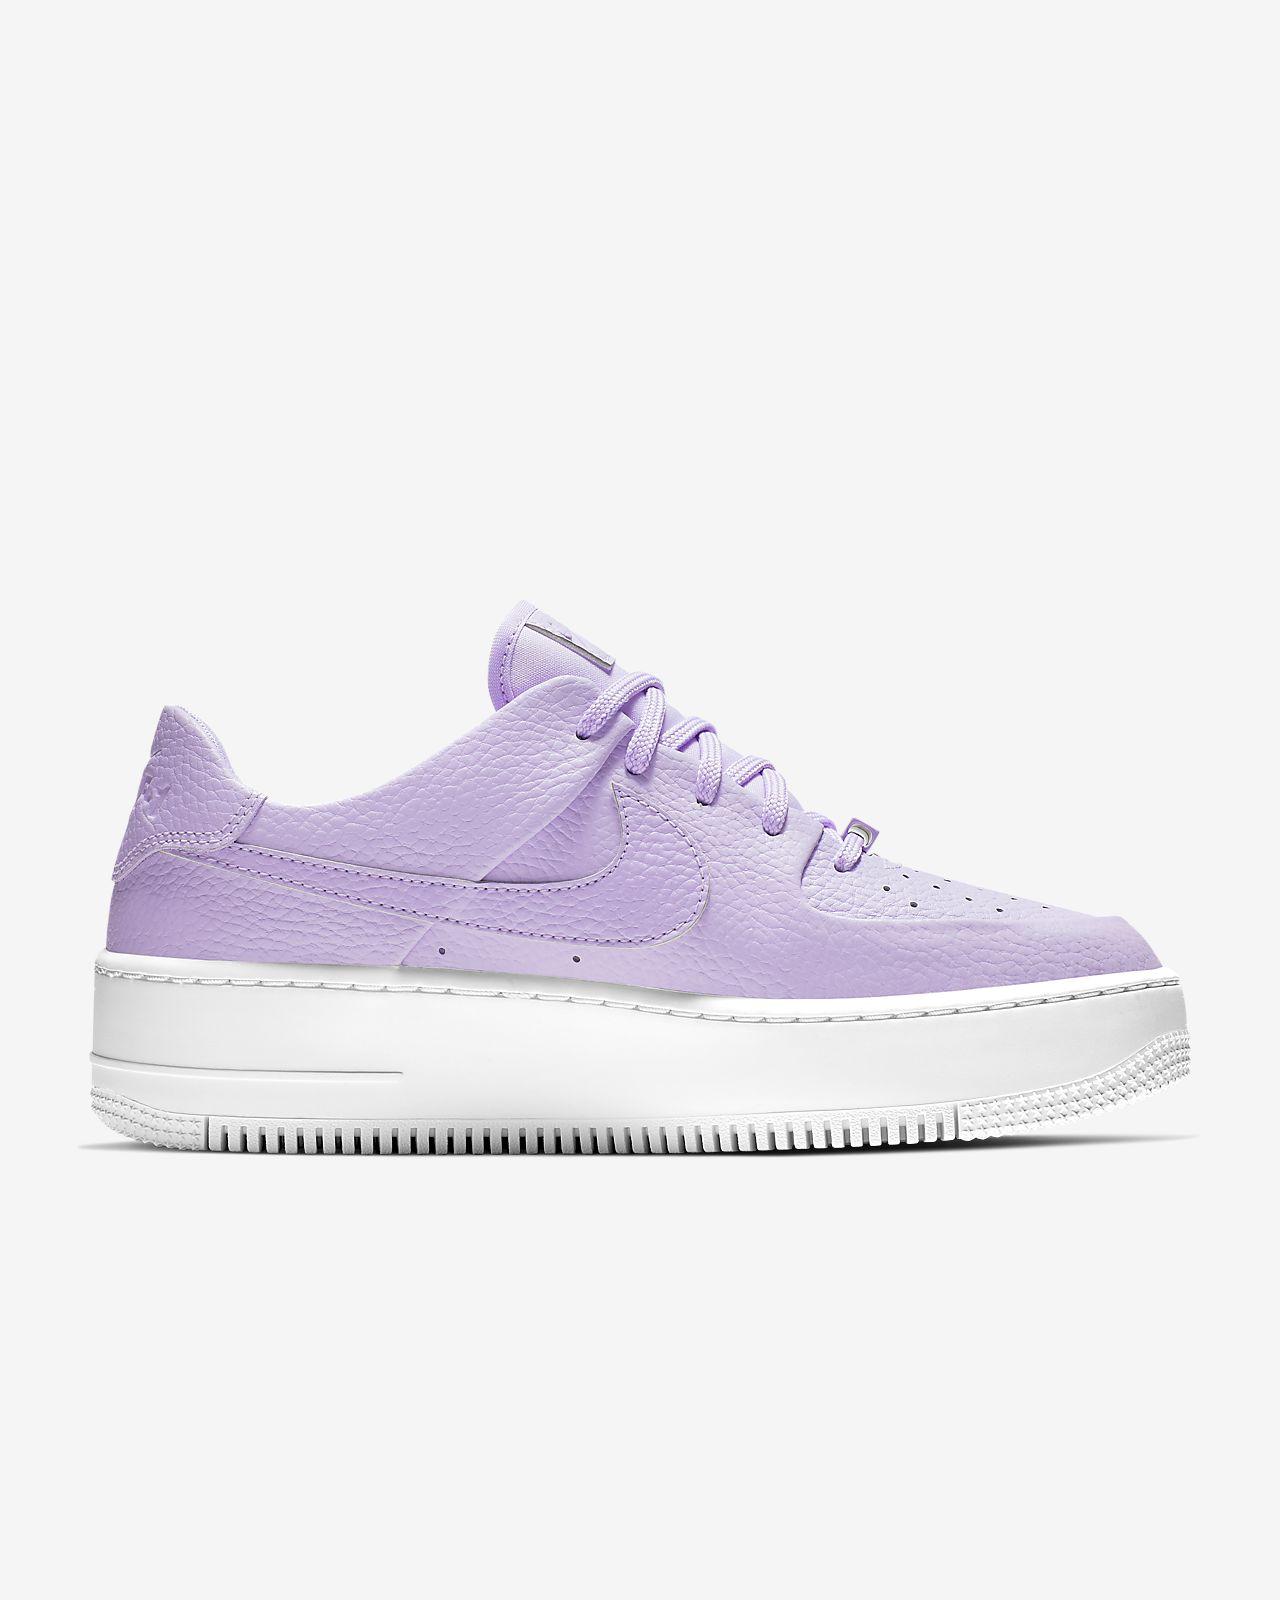 9854ad2ab1f Γυναικείο παπούτσι Nike Air Force 1 Sage Low. Nike.com GR